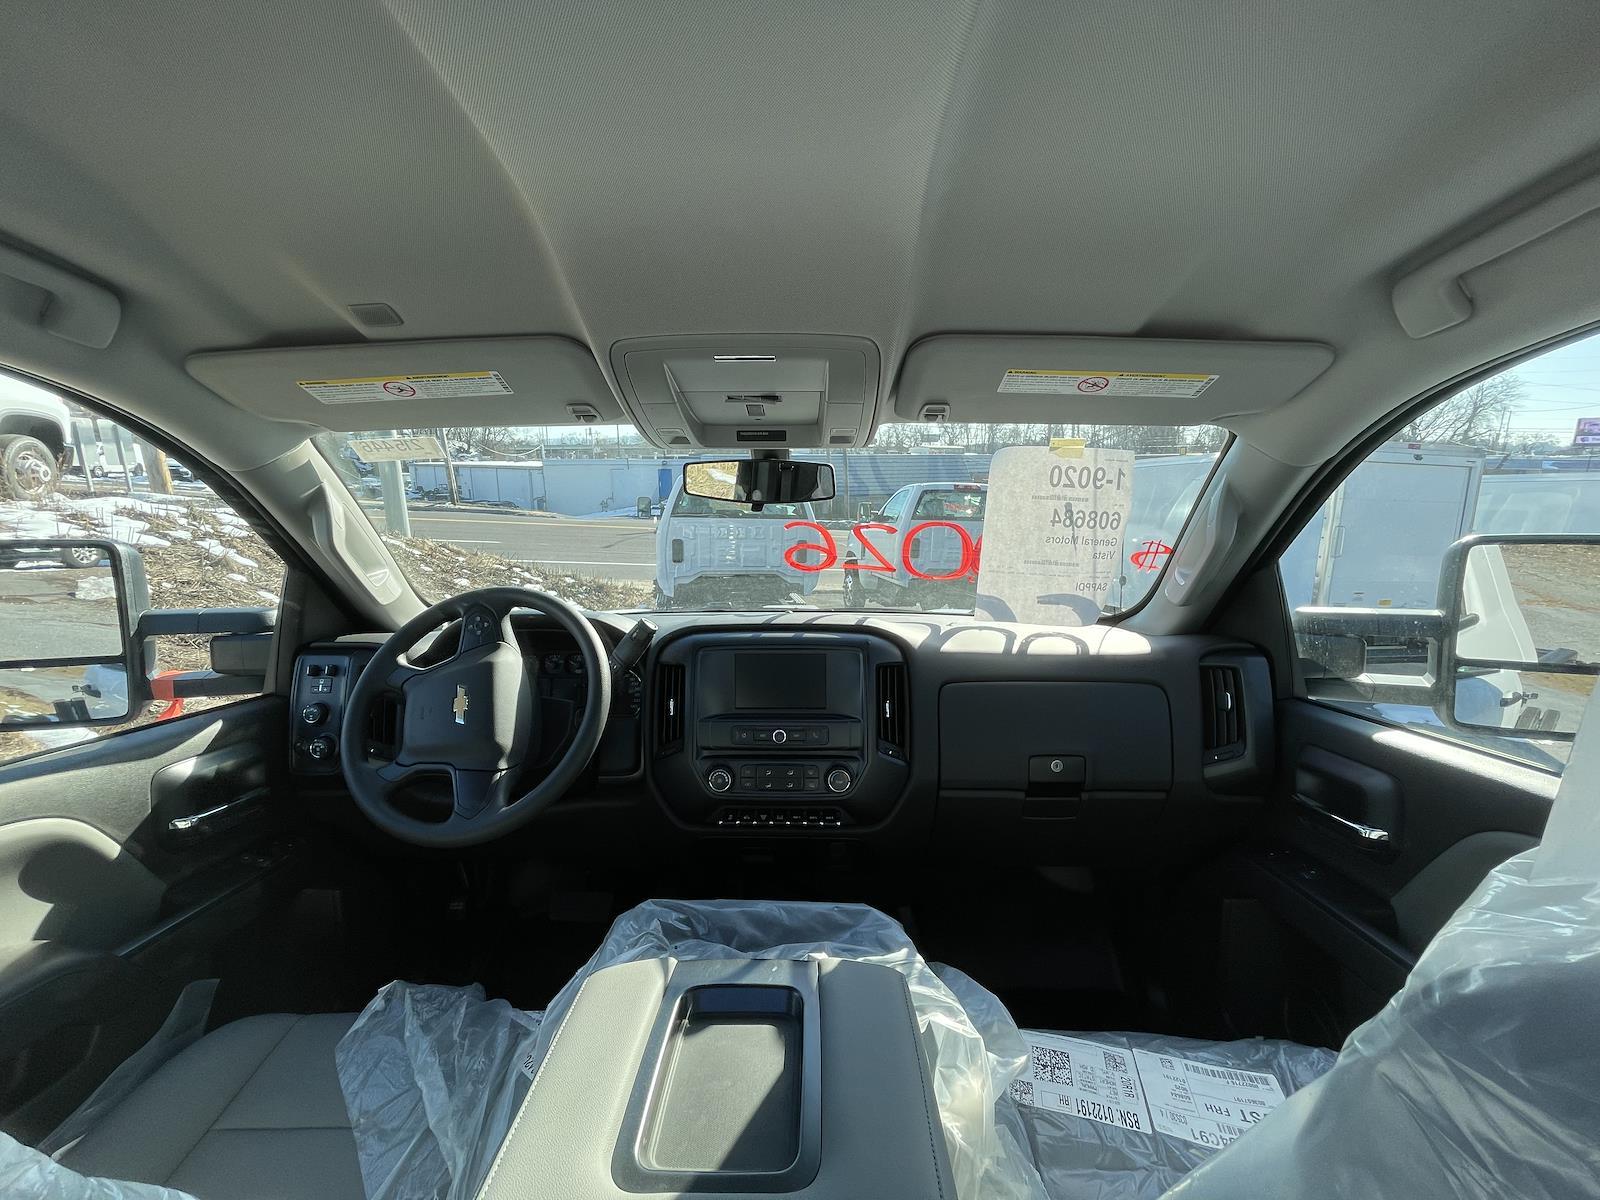 2021 Chevrolet Silverado 4500 Regular Cab DRW 4x4, Cab Chassis #215446 - photo 3